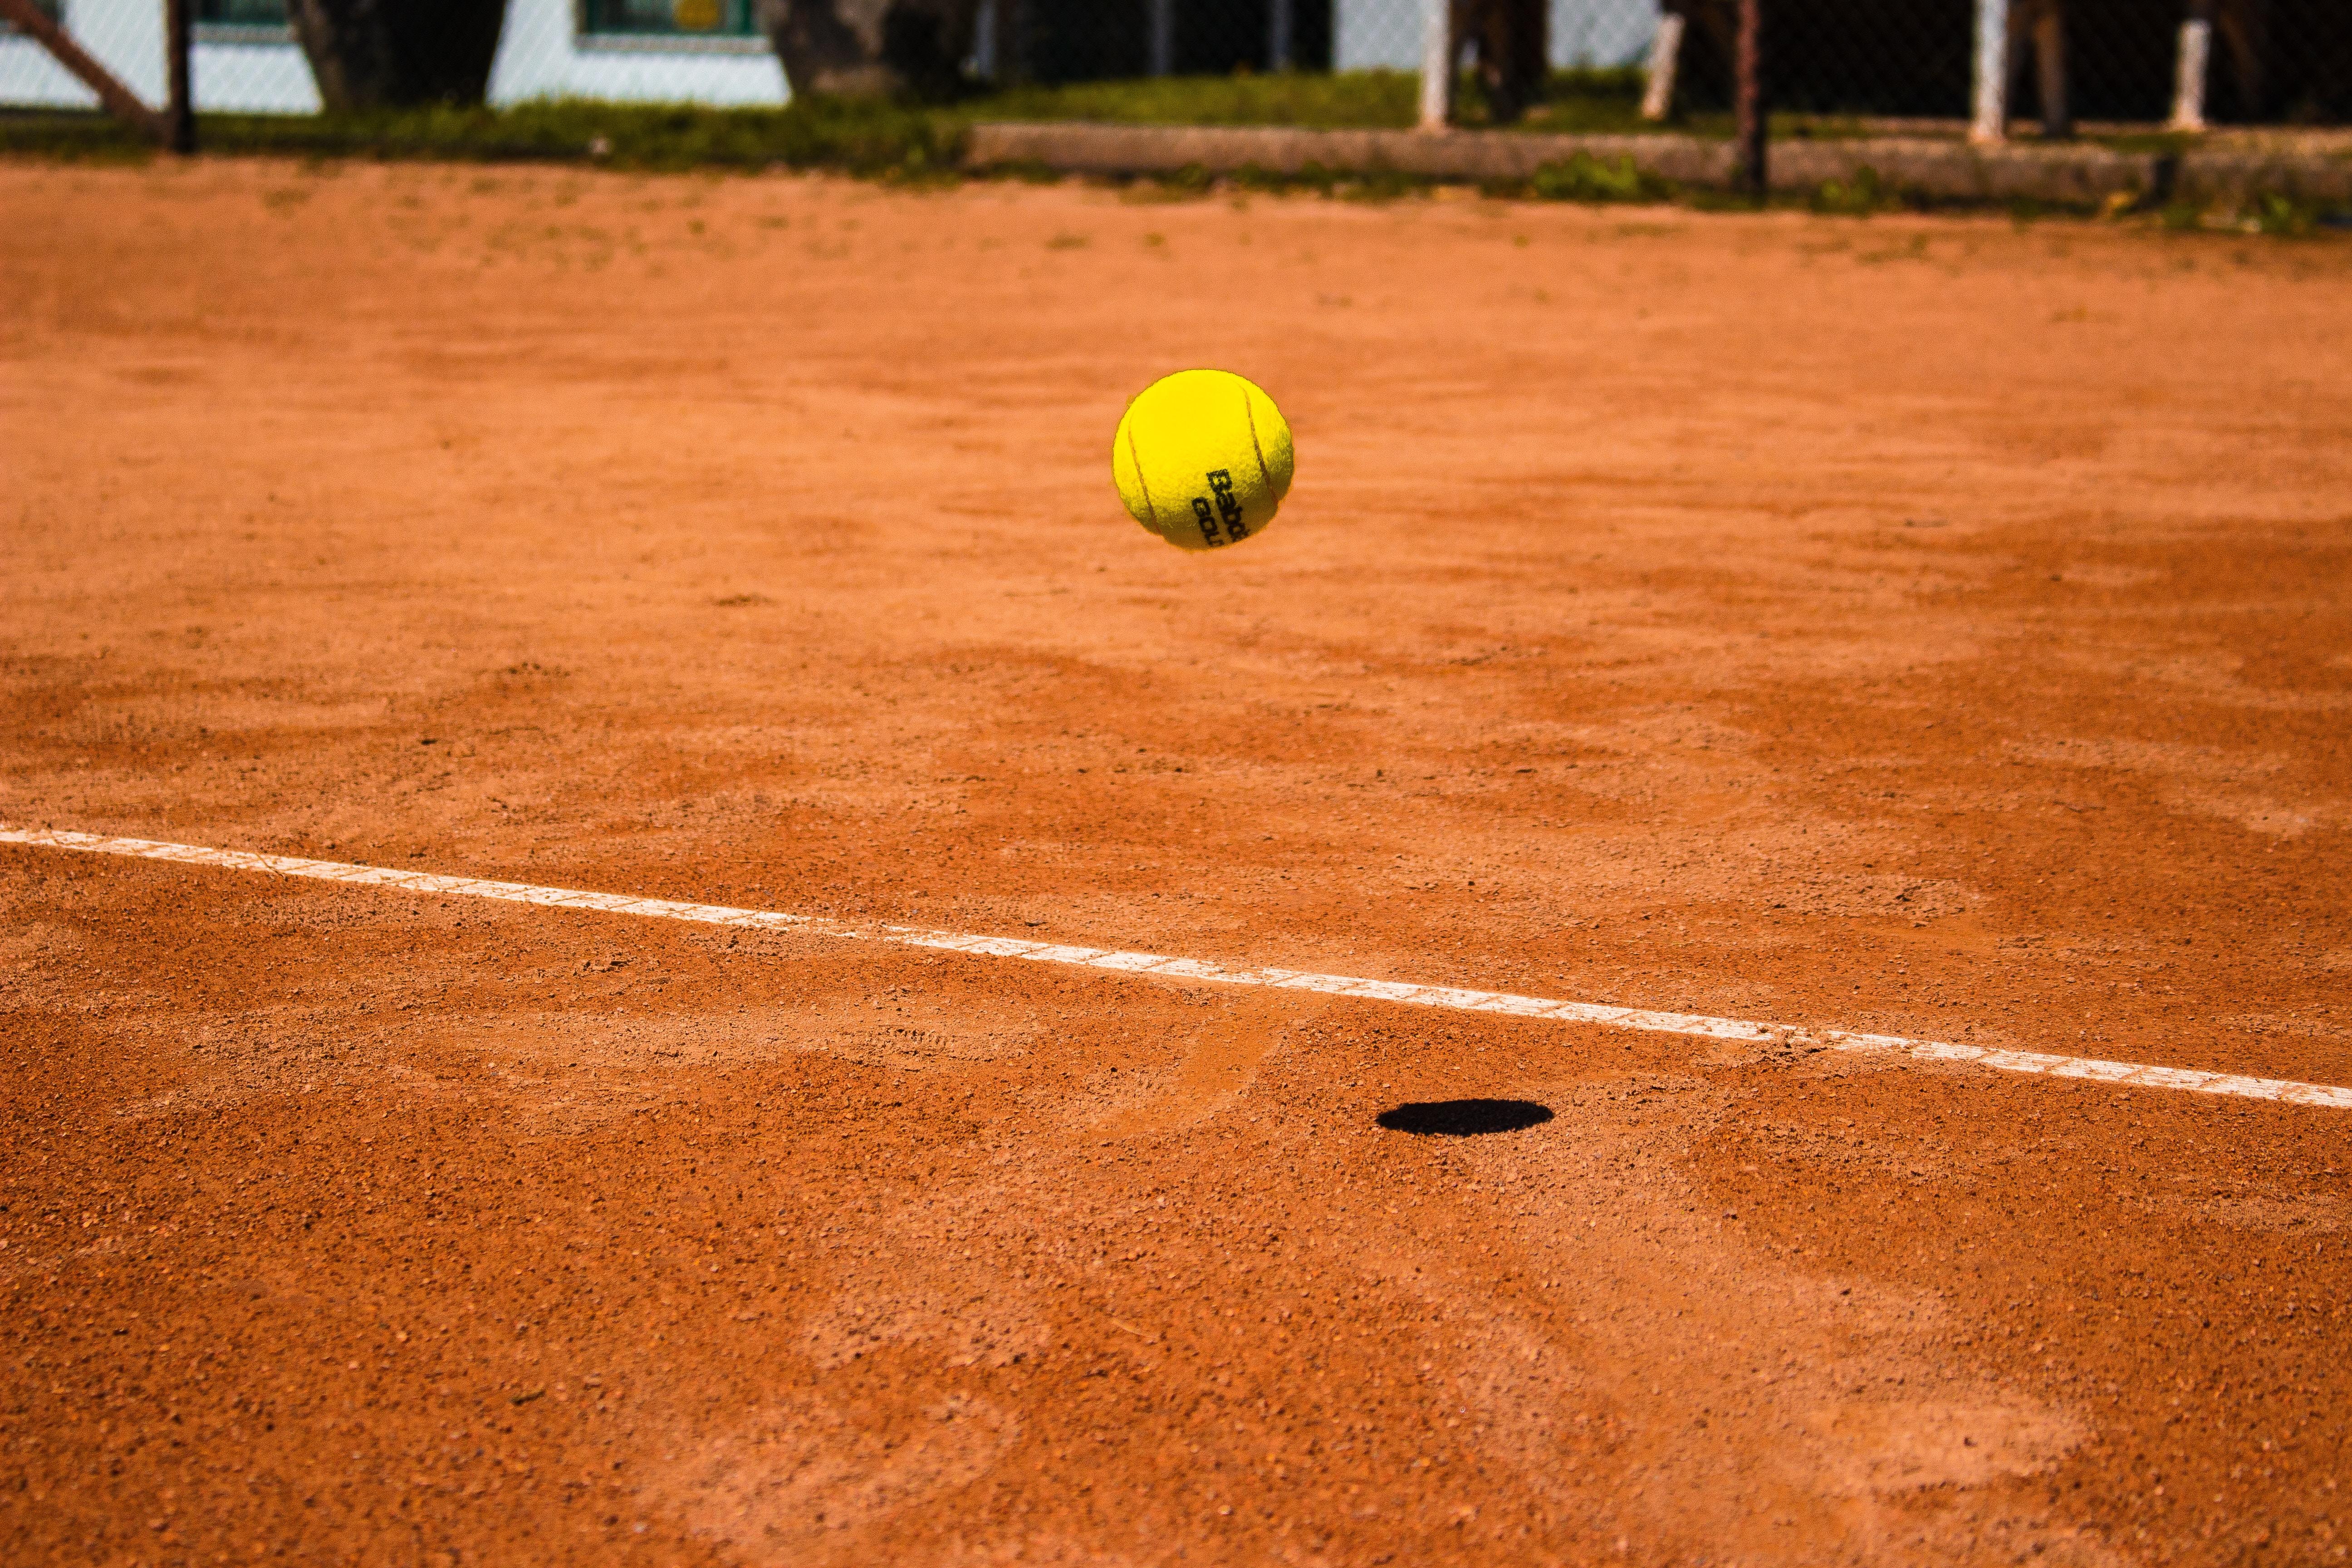 Tennis ball bouncing on a court